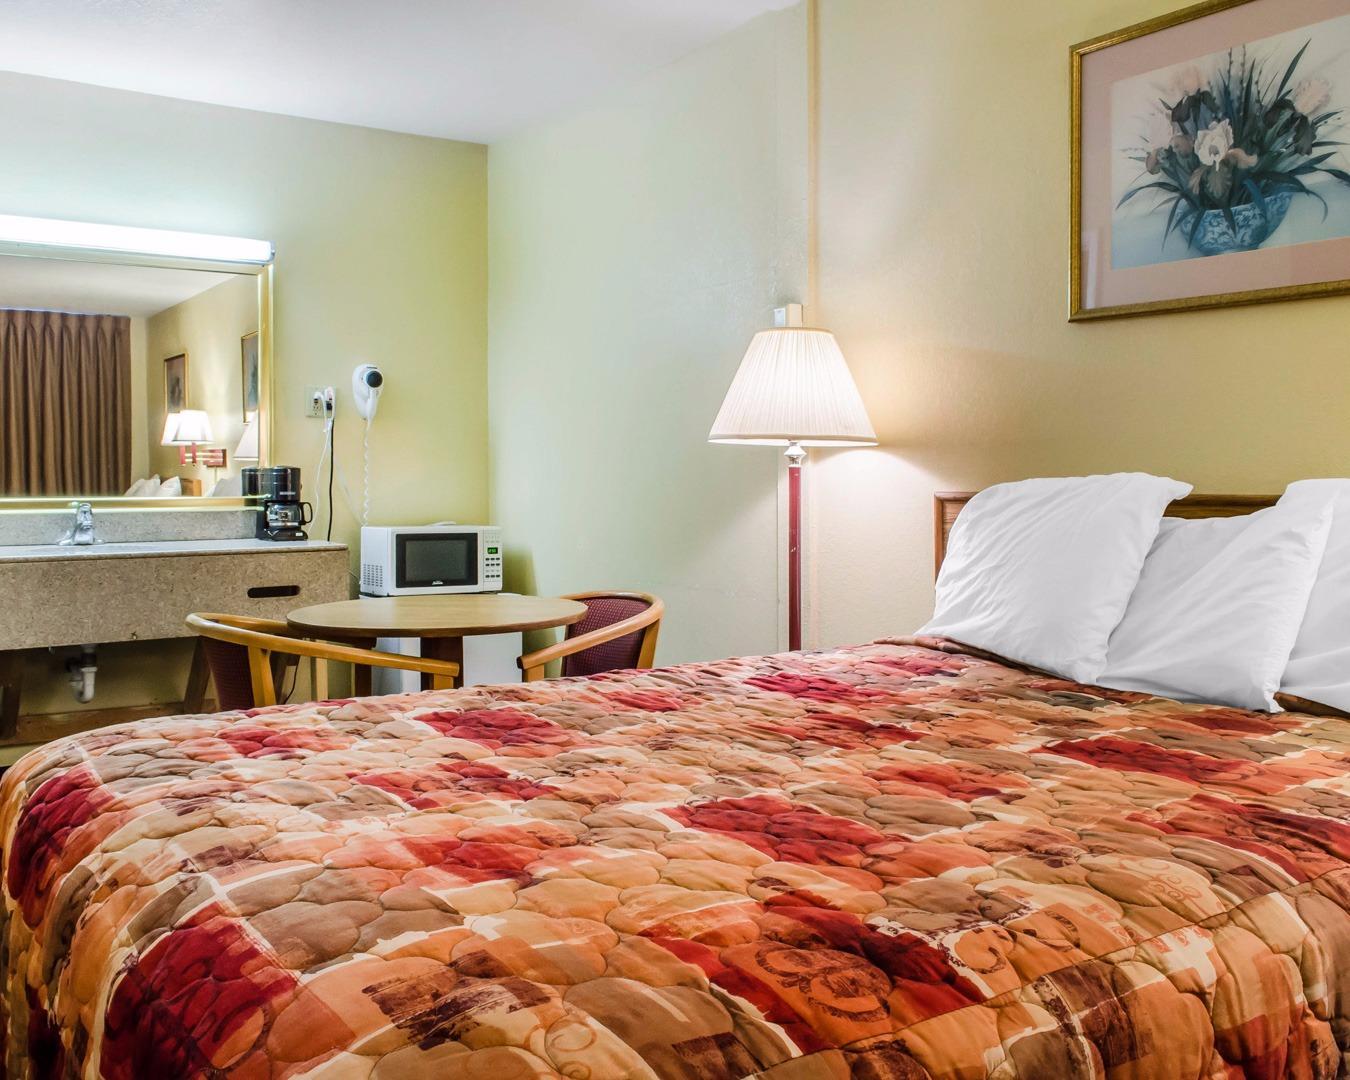 Rodeway Inn image 14